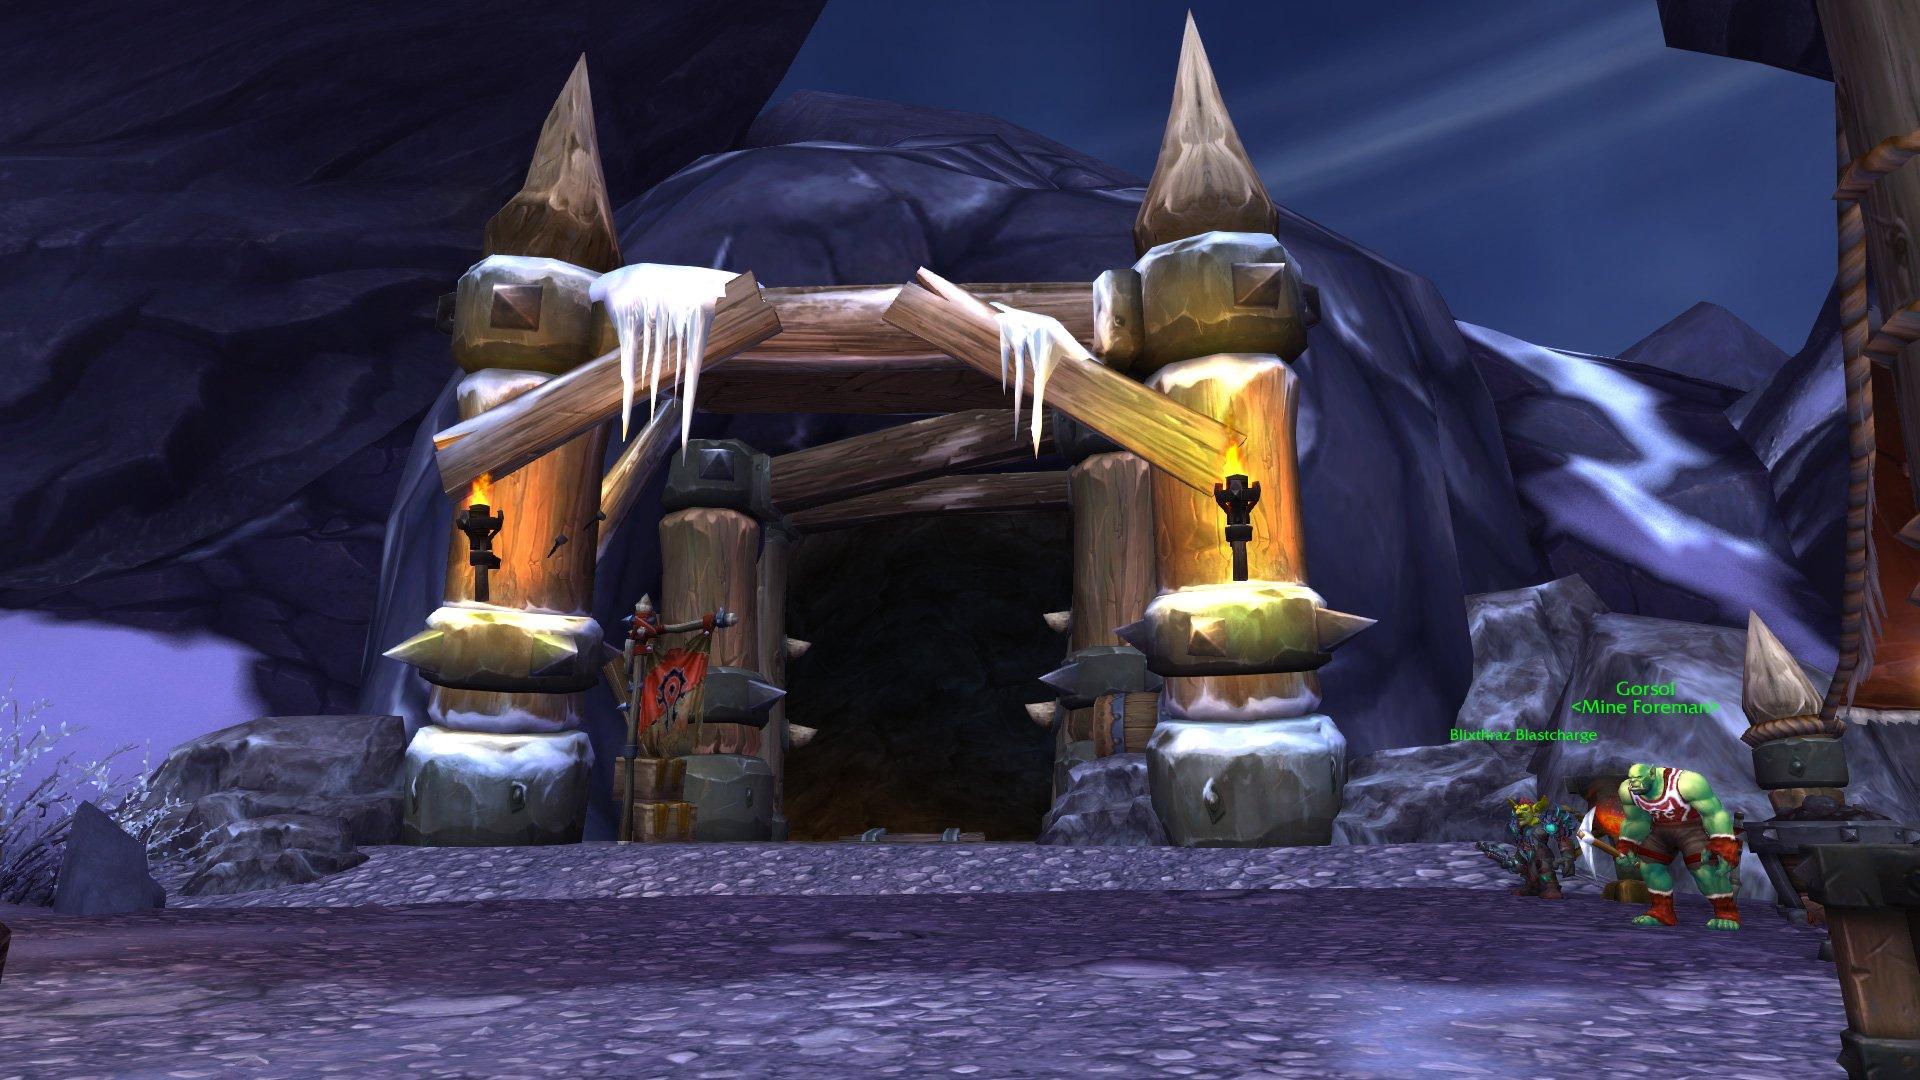 Warlords of draenor garrisons lunarfall excavation frostwall level 1 screenshots level 2 screenshots malvernweather Images